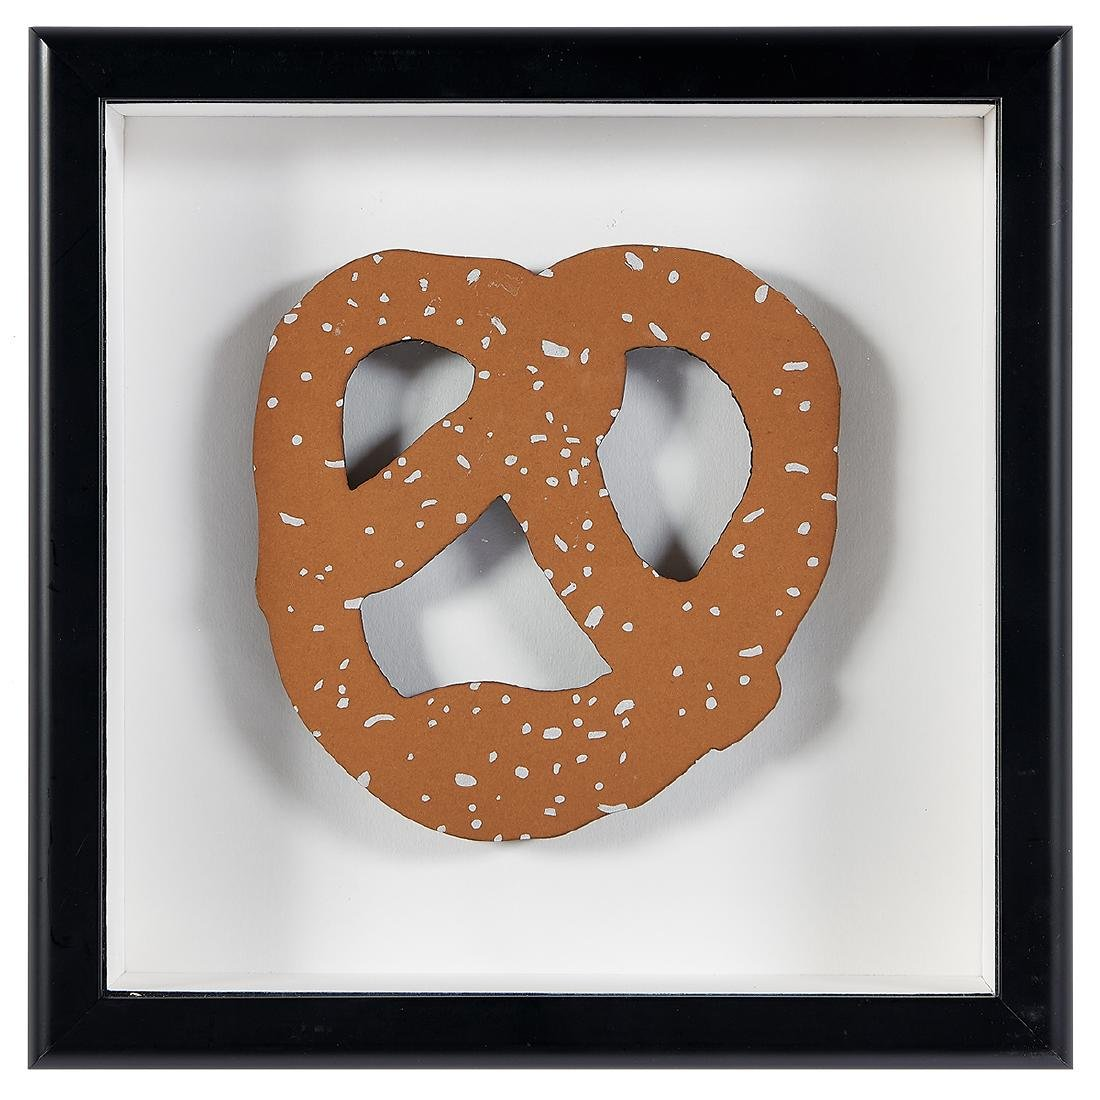 Claes Oldenburg, N.Y.C. Pretzel